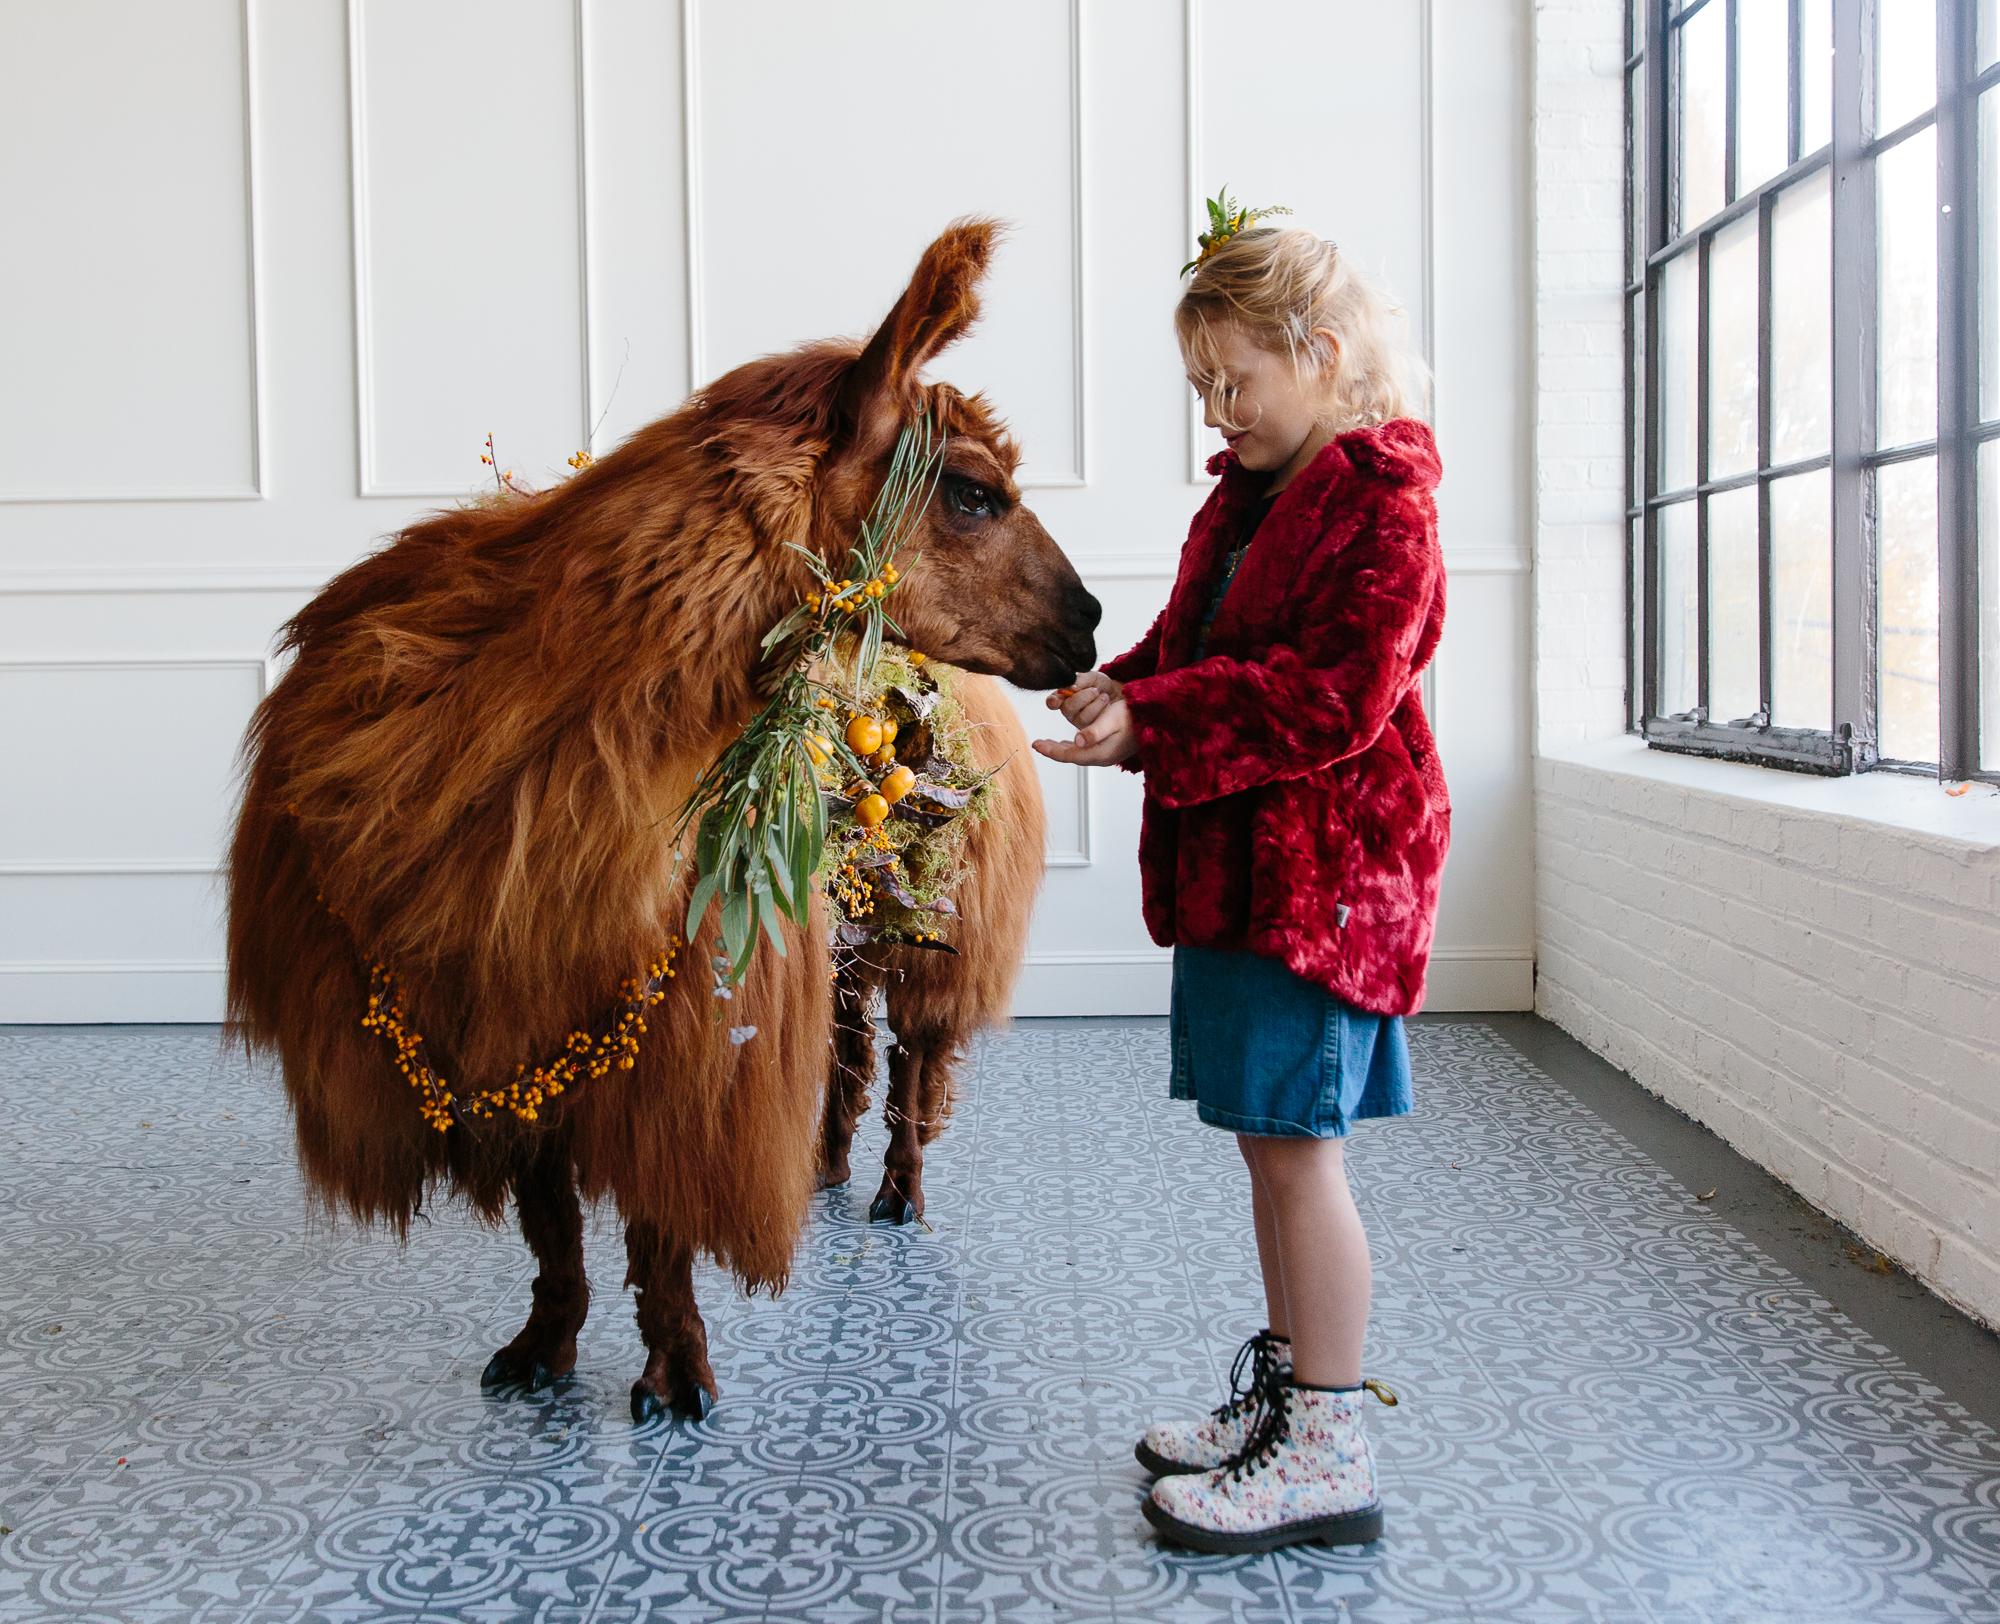 llama_portland_animal-31.JPG